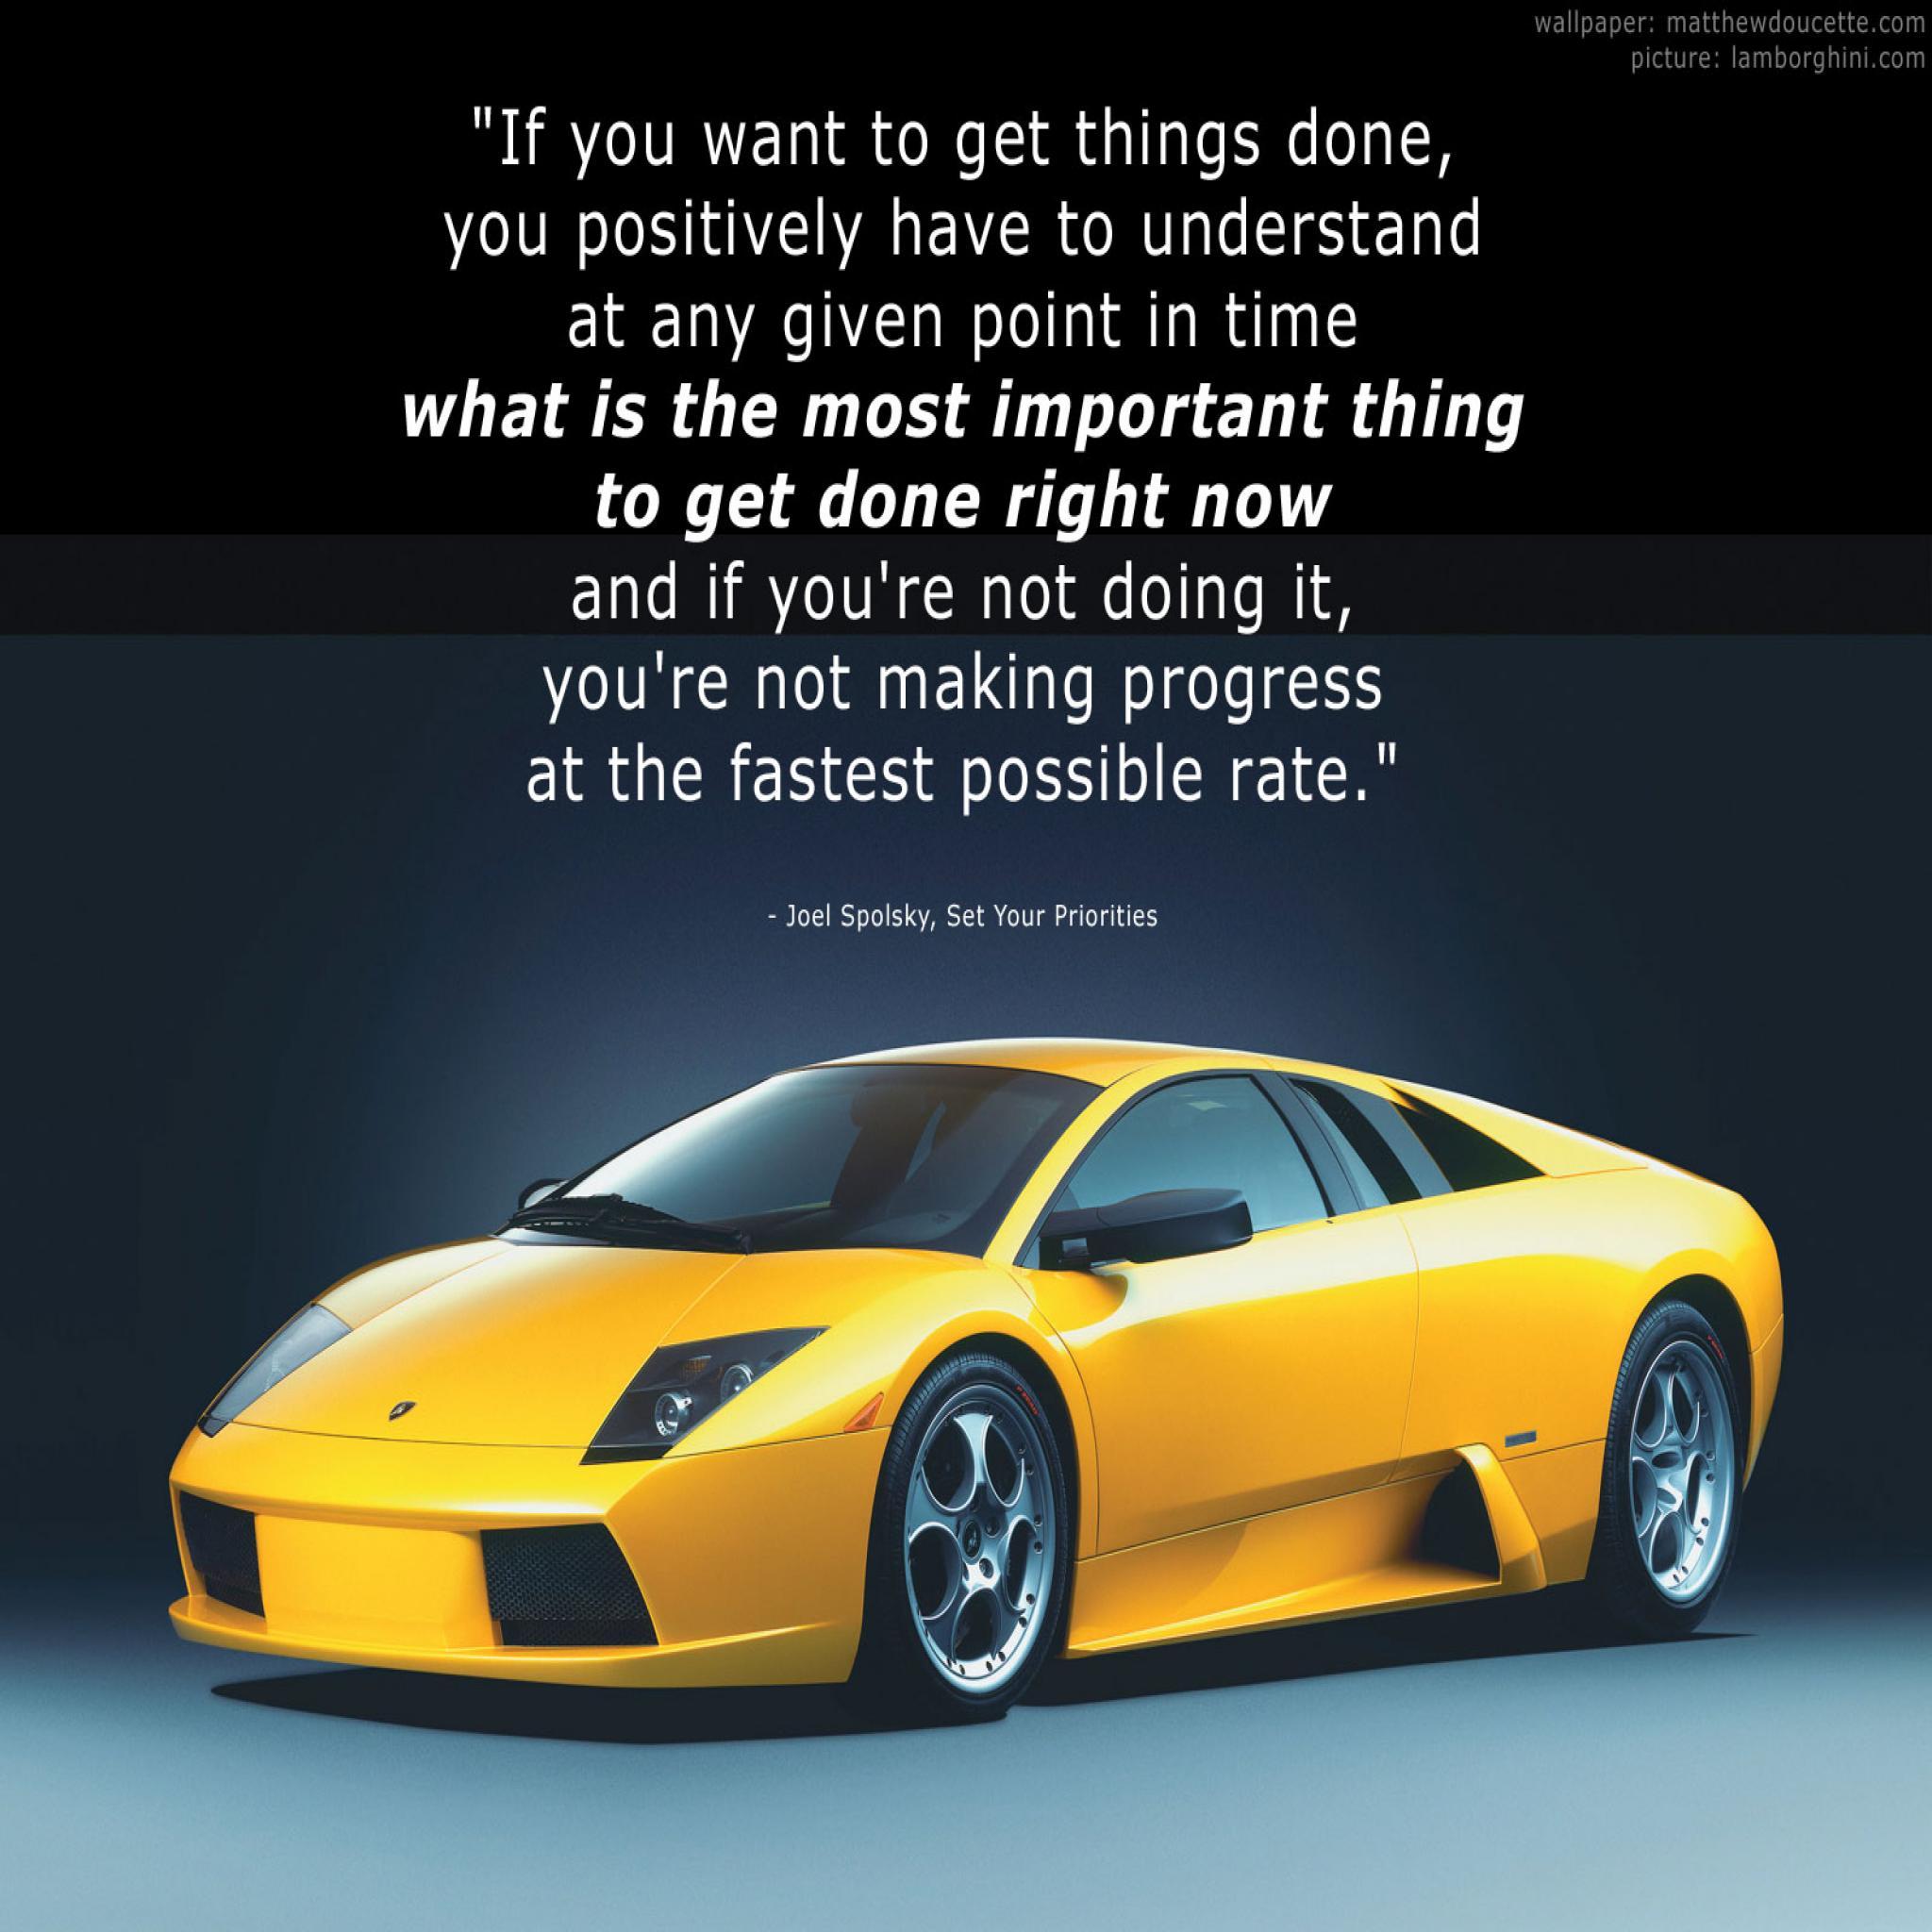 desktop wallpapersDaily Quotes Inspirational desktop wallpapers 2048x2048